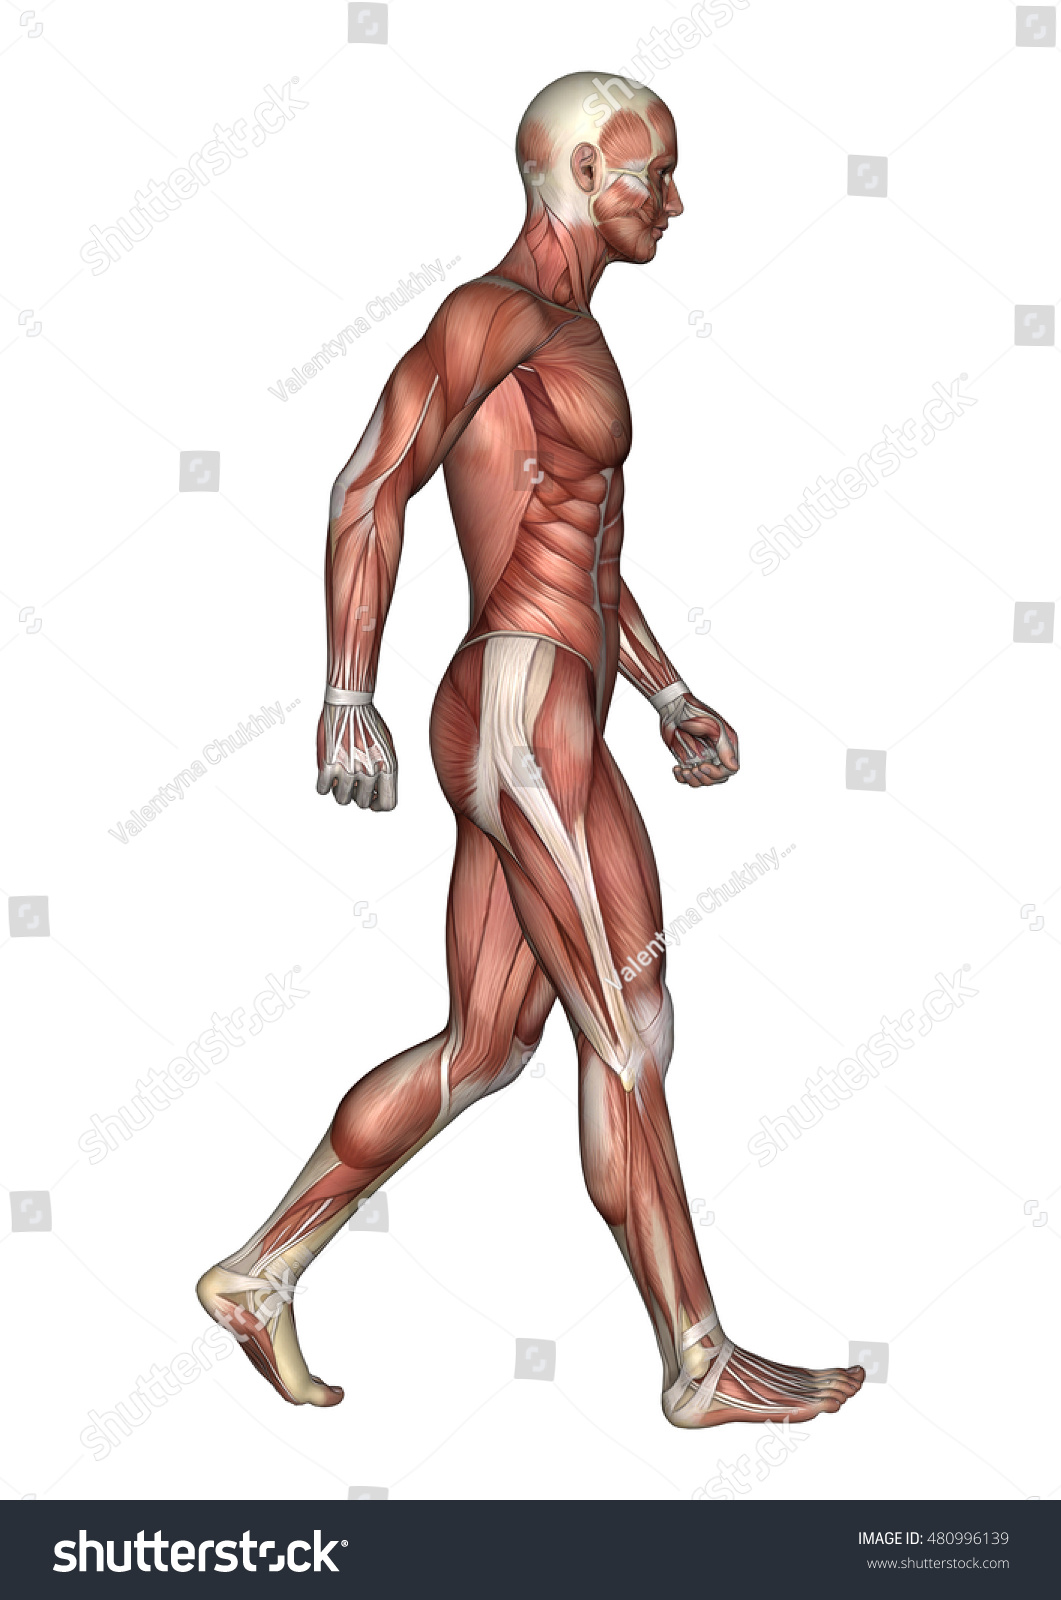 3 D Rendering Walking Male Anatomy Figure Stock Illustration ...